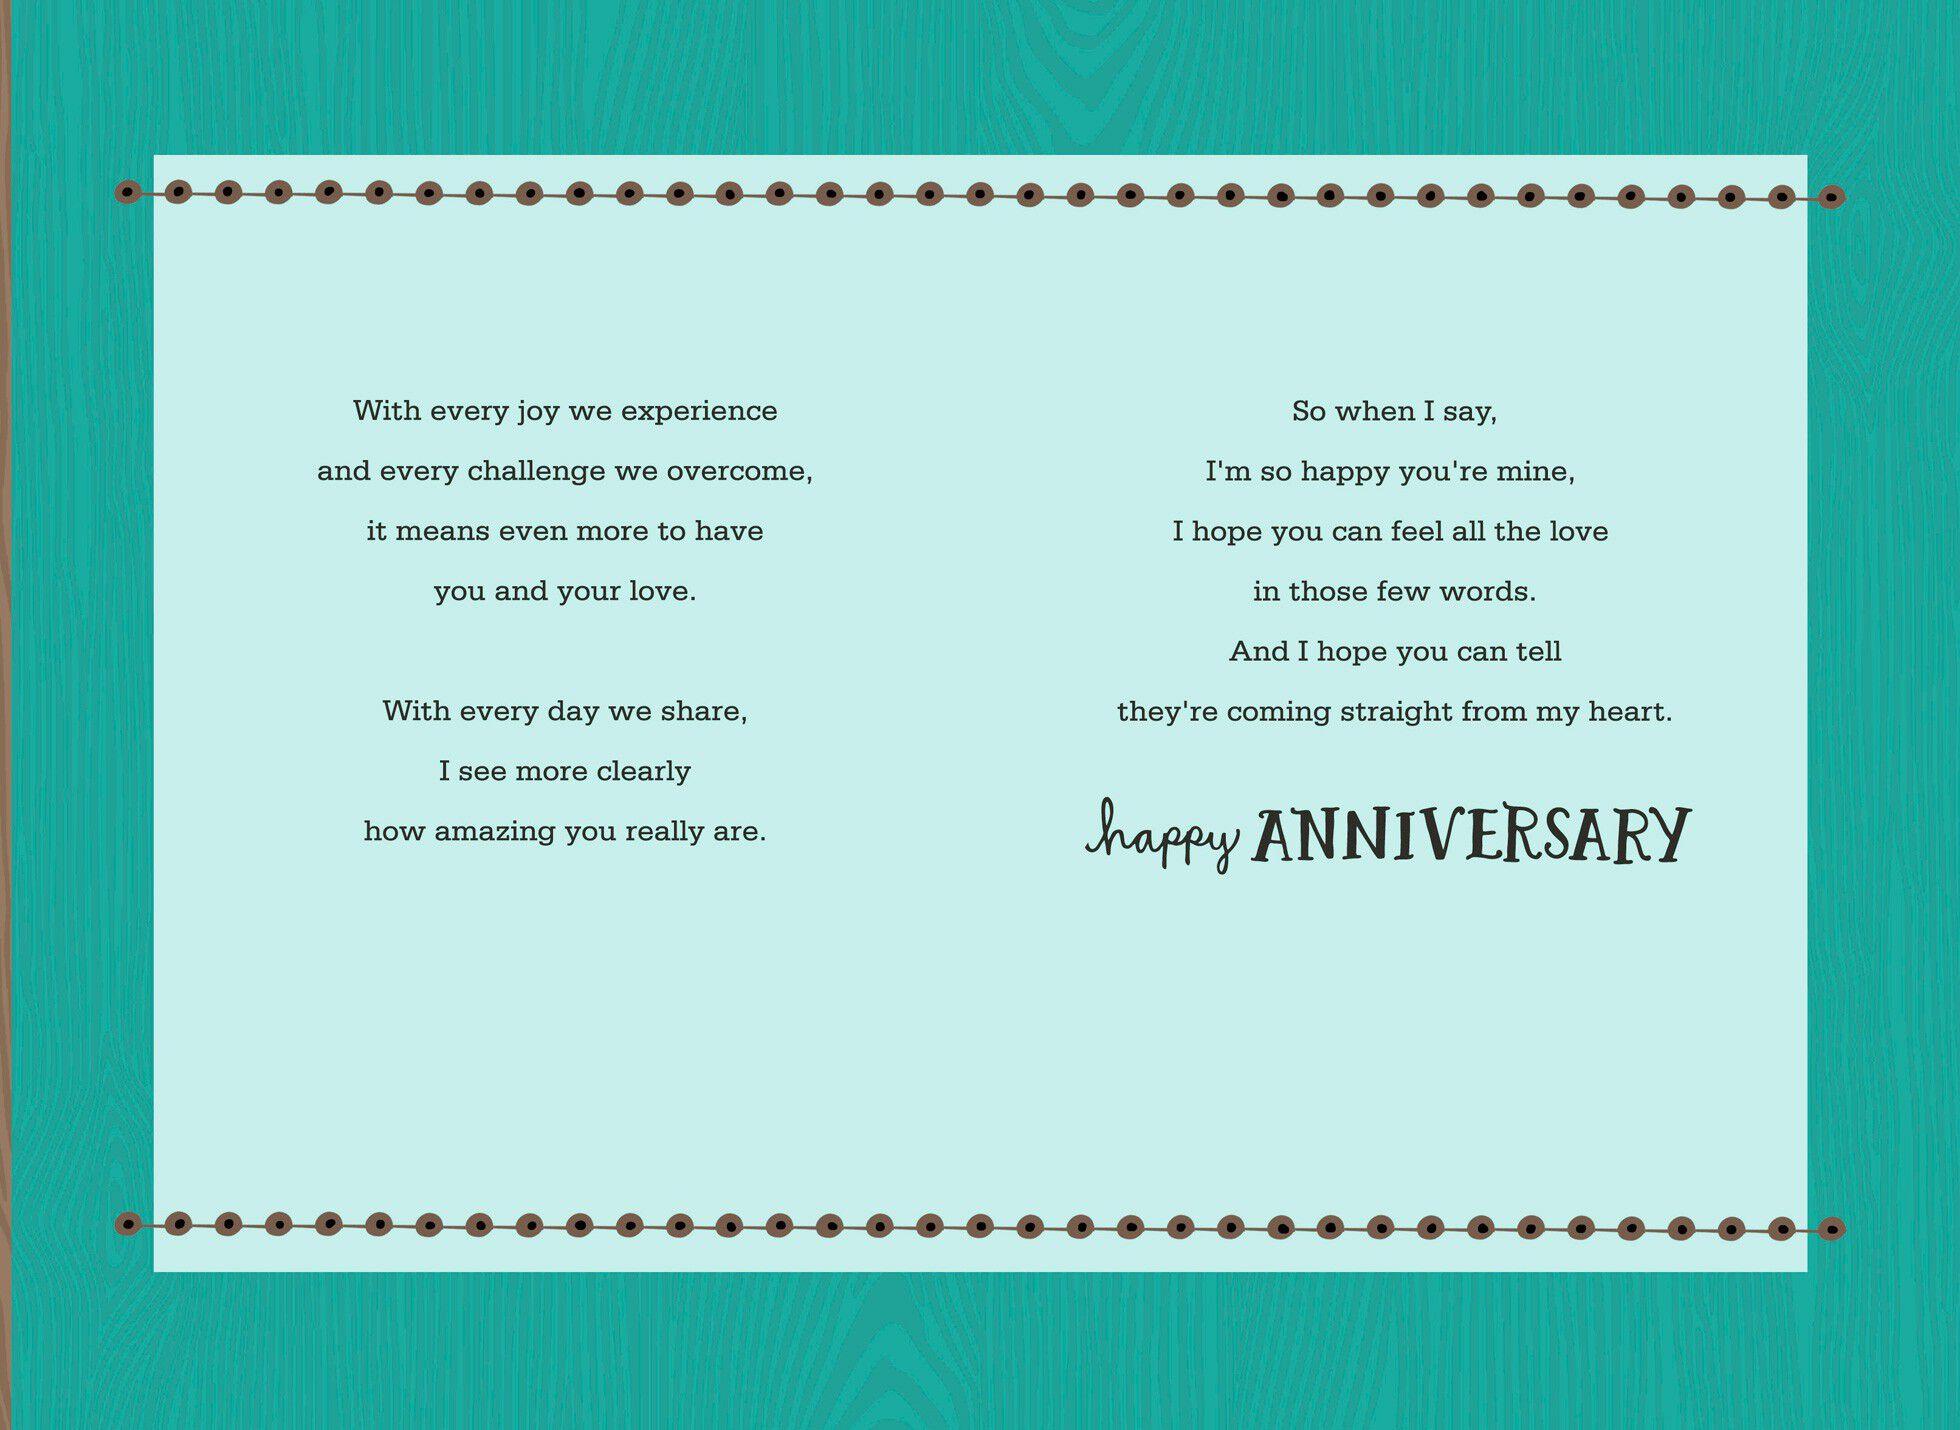 Hallmark Wedding Anniversary Gifts: All Anniversary